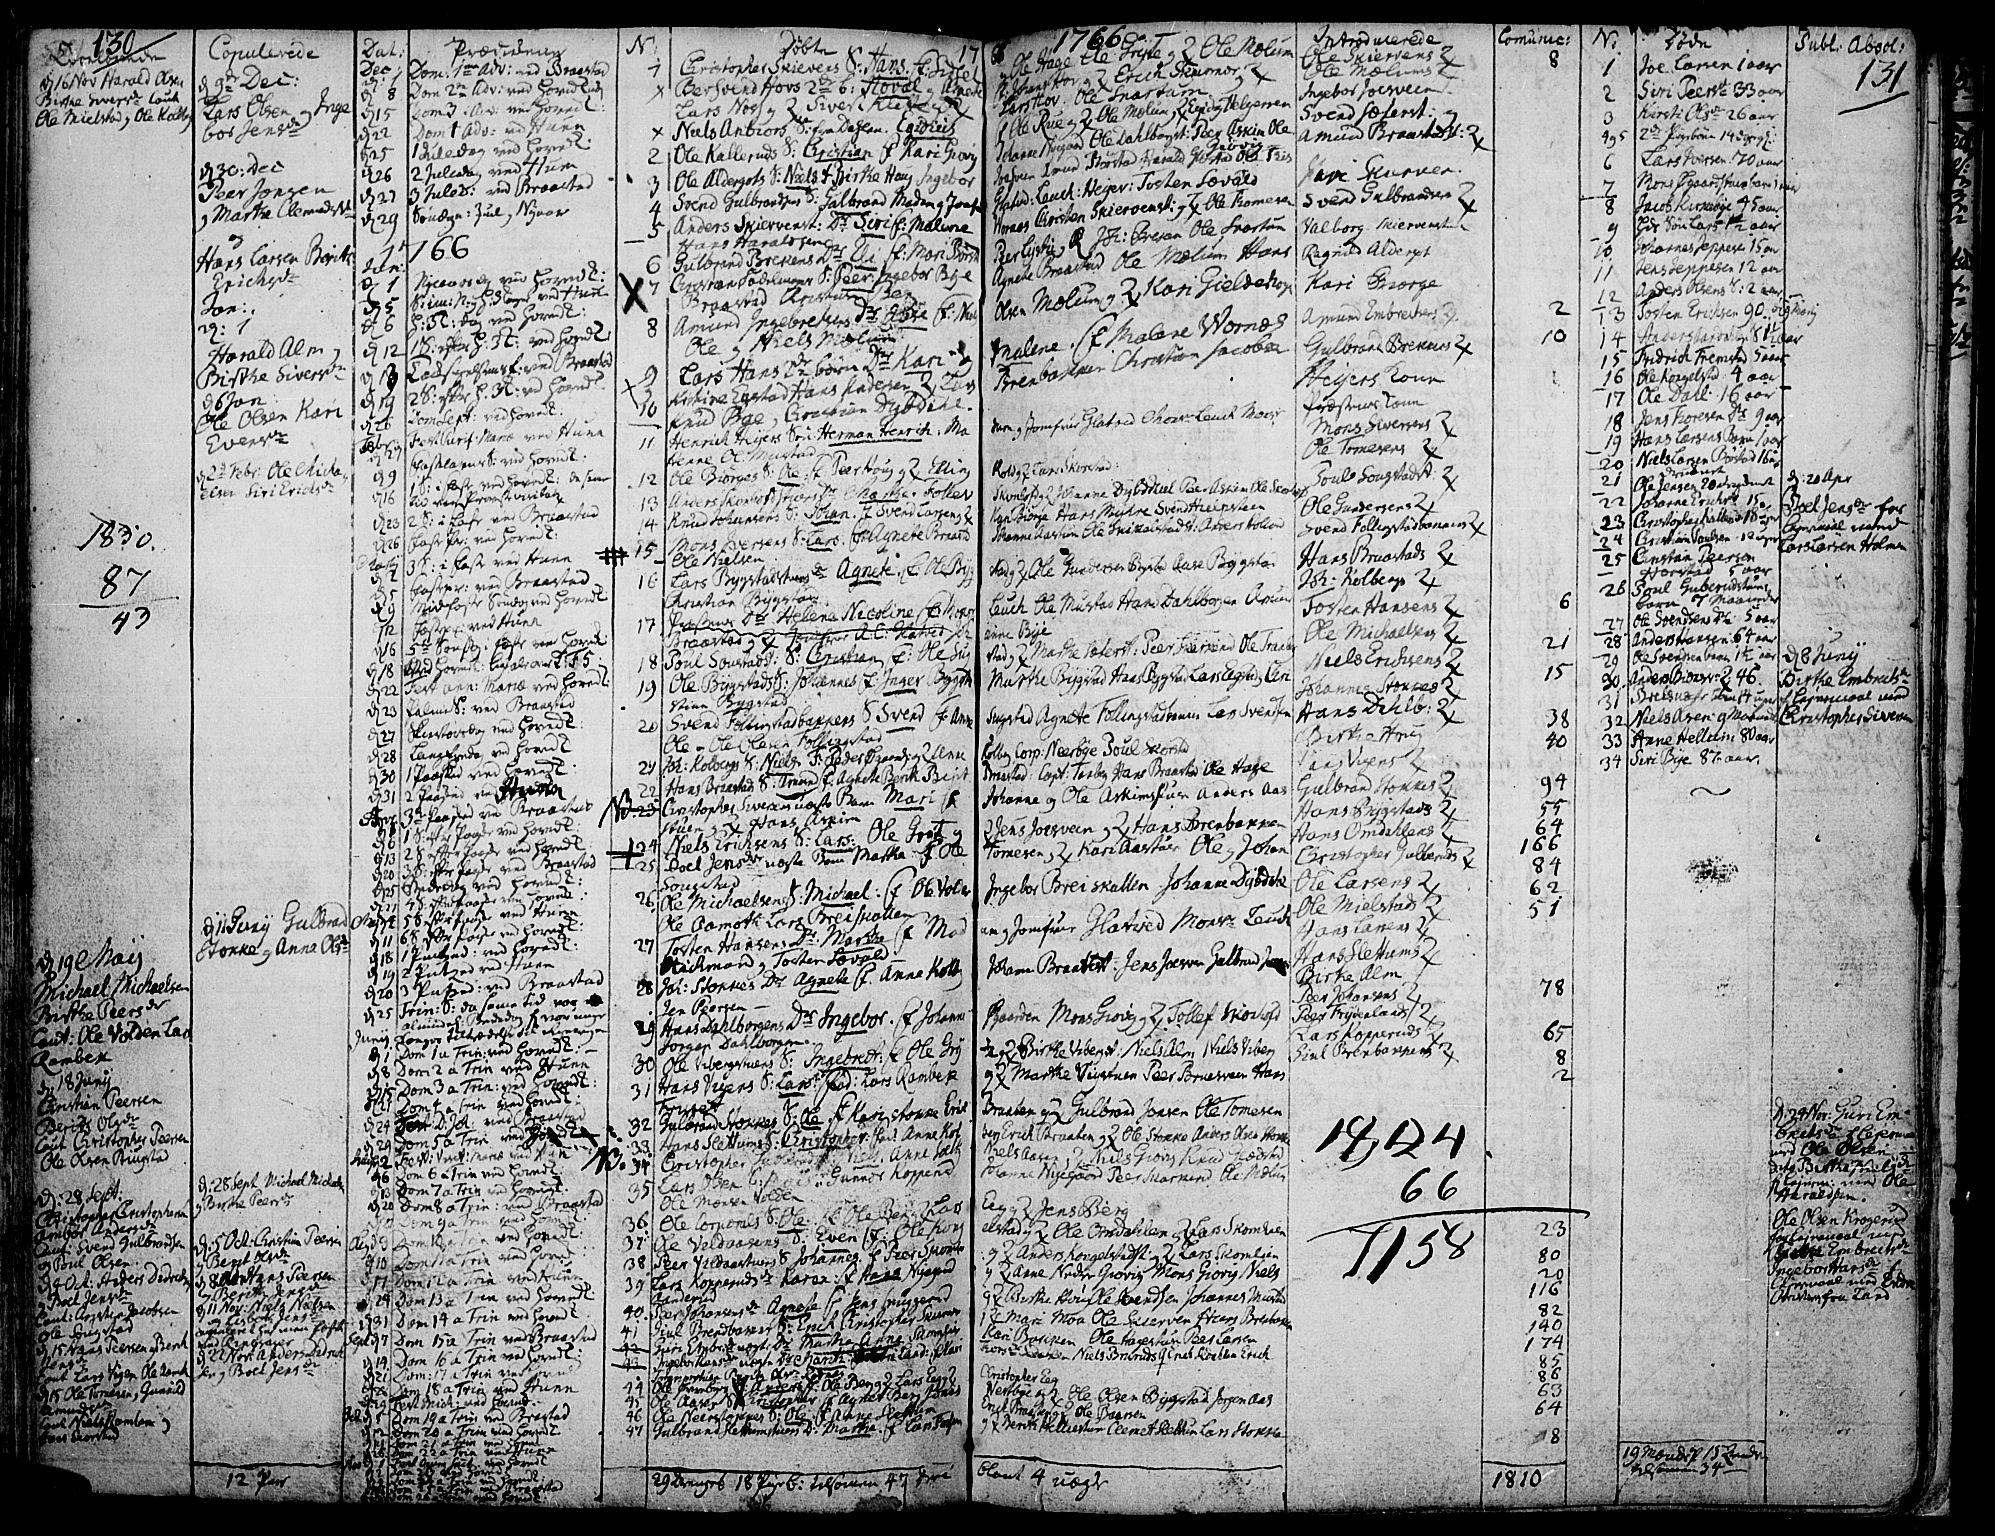 SAH, Vardal prestekontor, H/Ha/Haa/L0002: Ministerialbok nr. 2, 1748-1776, s. 130-131